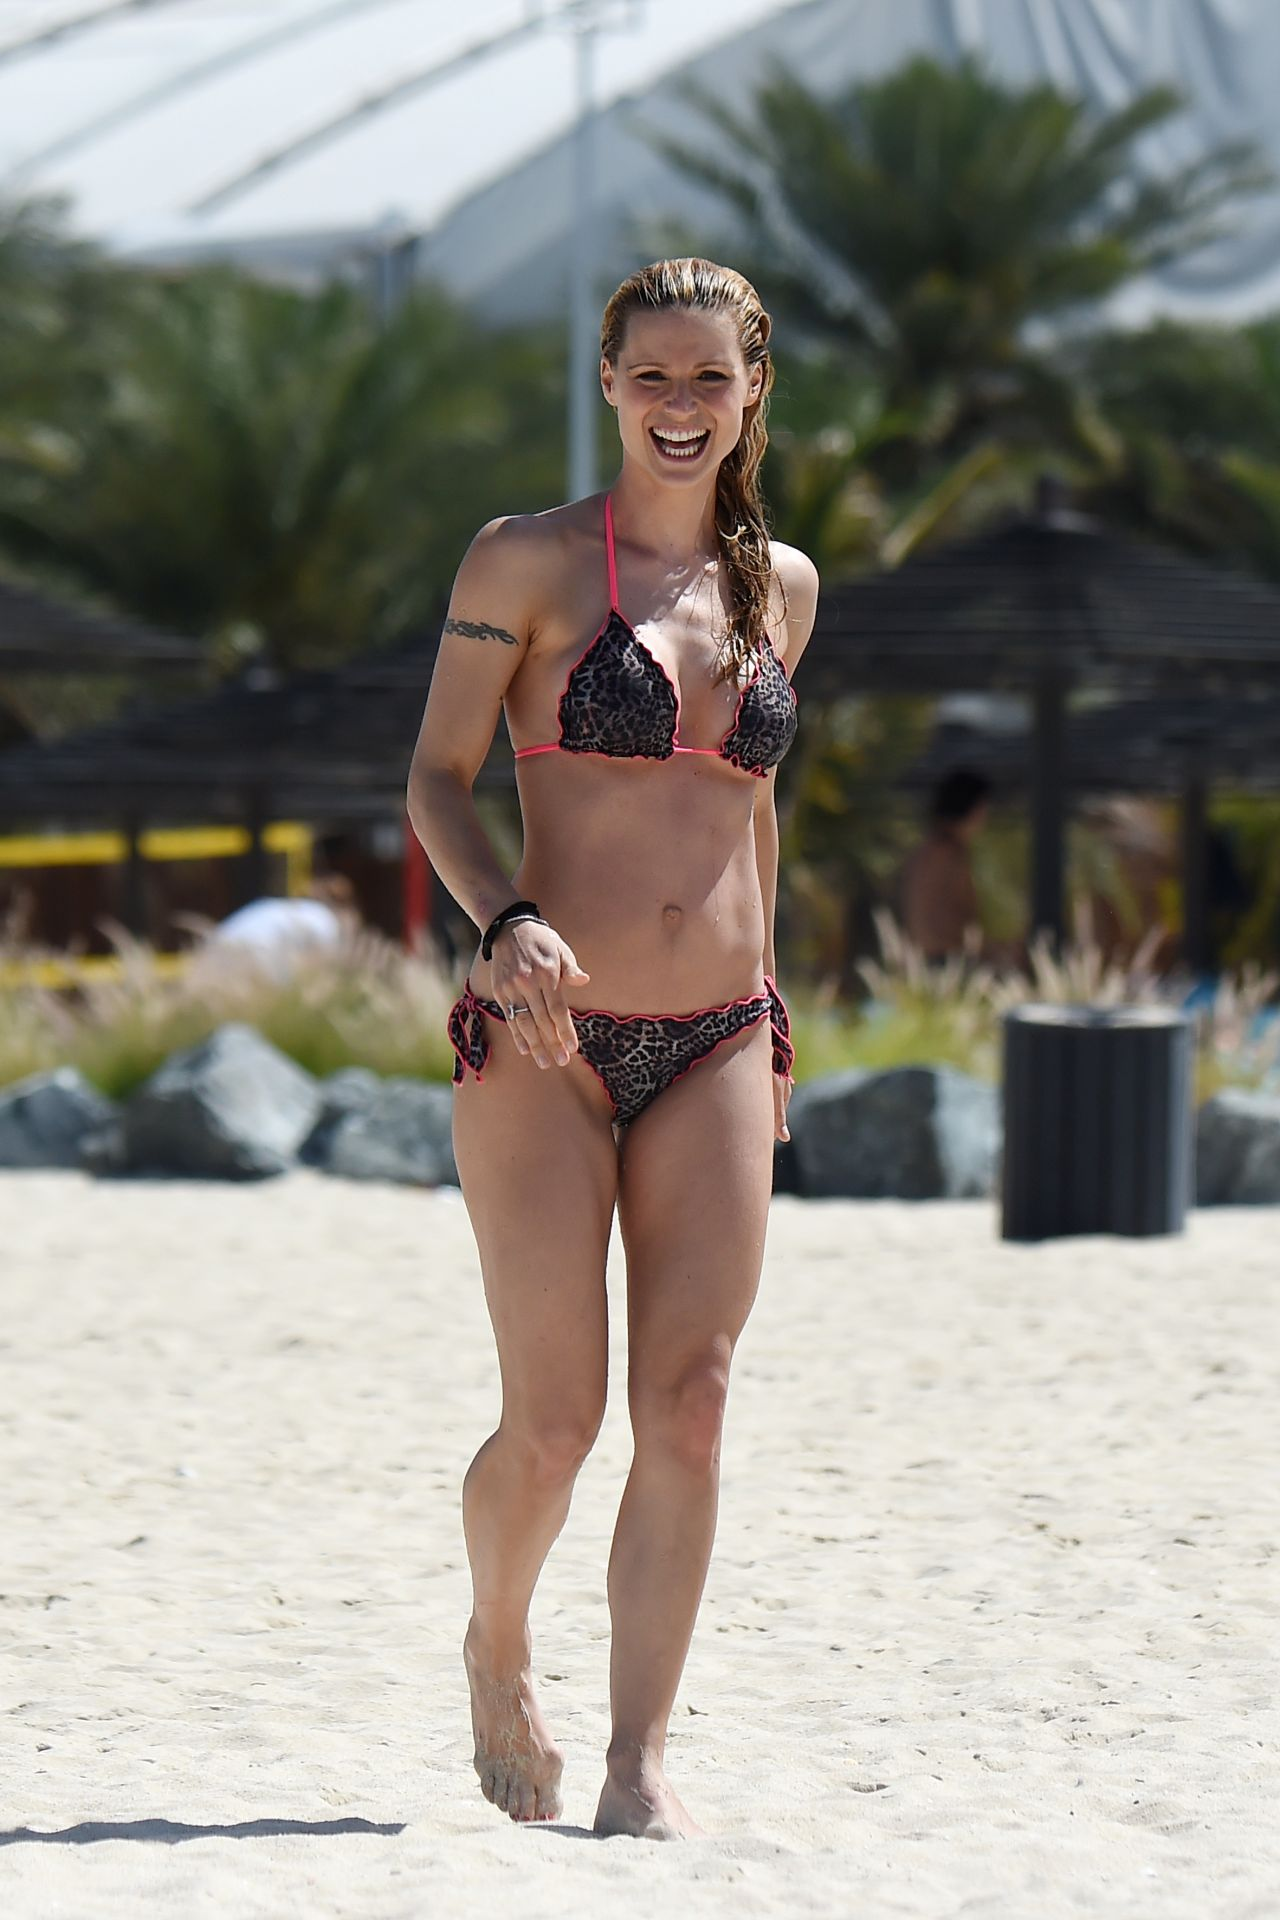 Michelle Hunziker In Bikini Beach In Dubai 3 27 2016